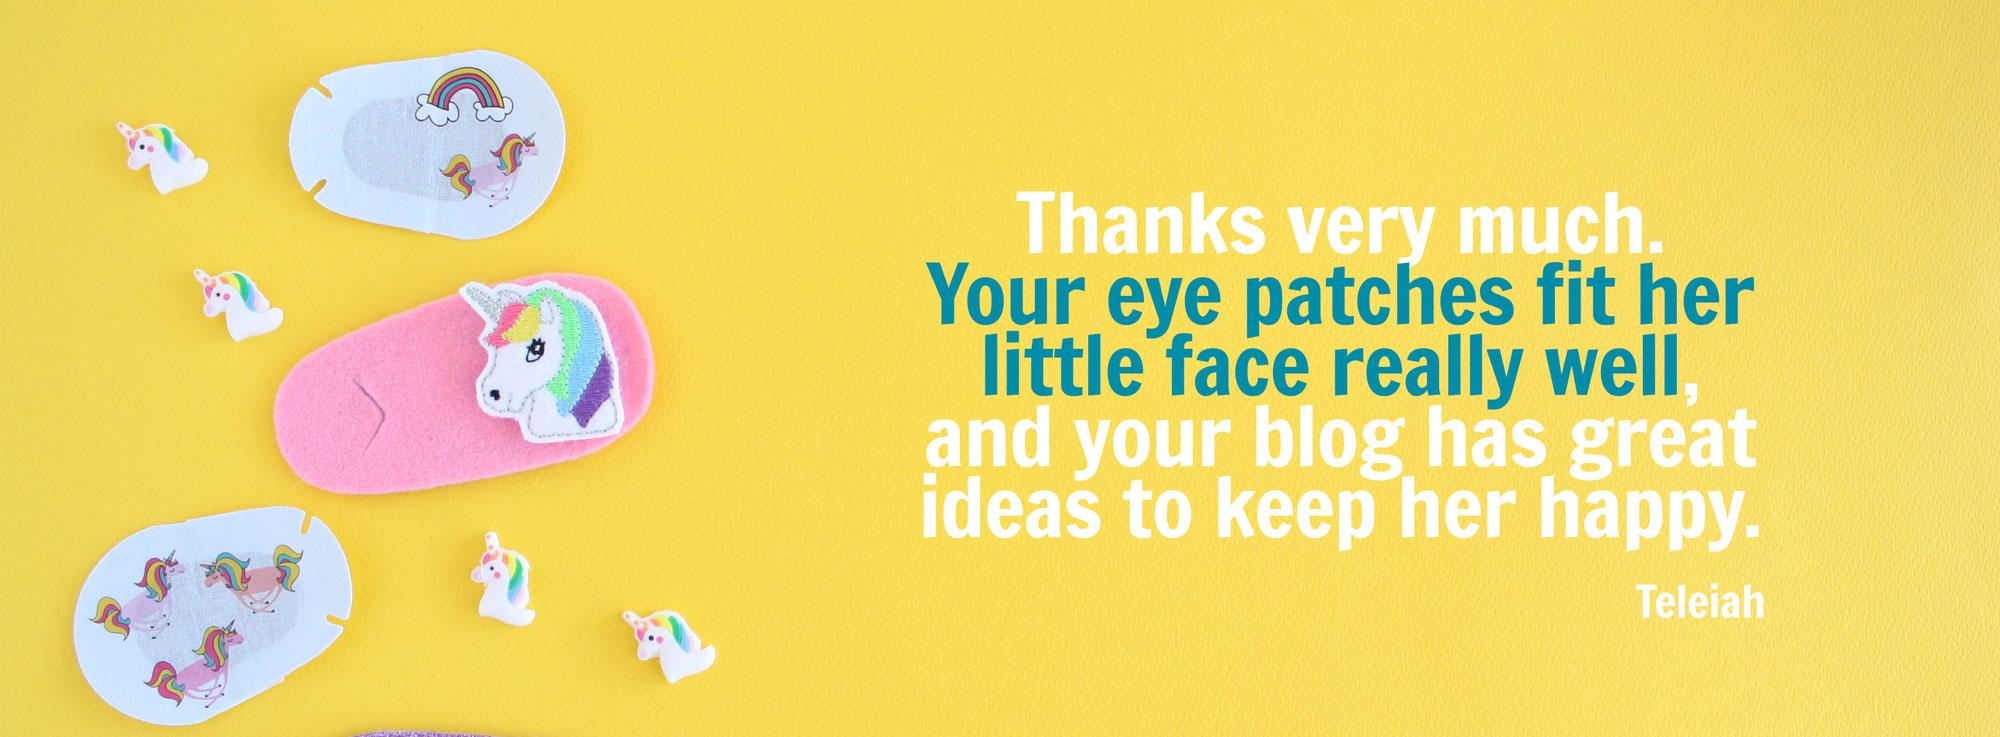 Best eye patches for children testimonial